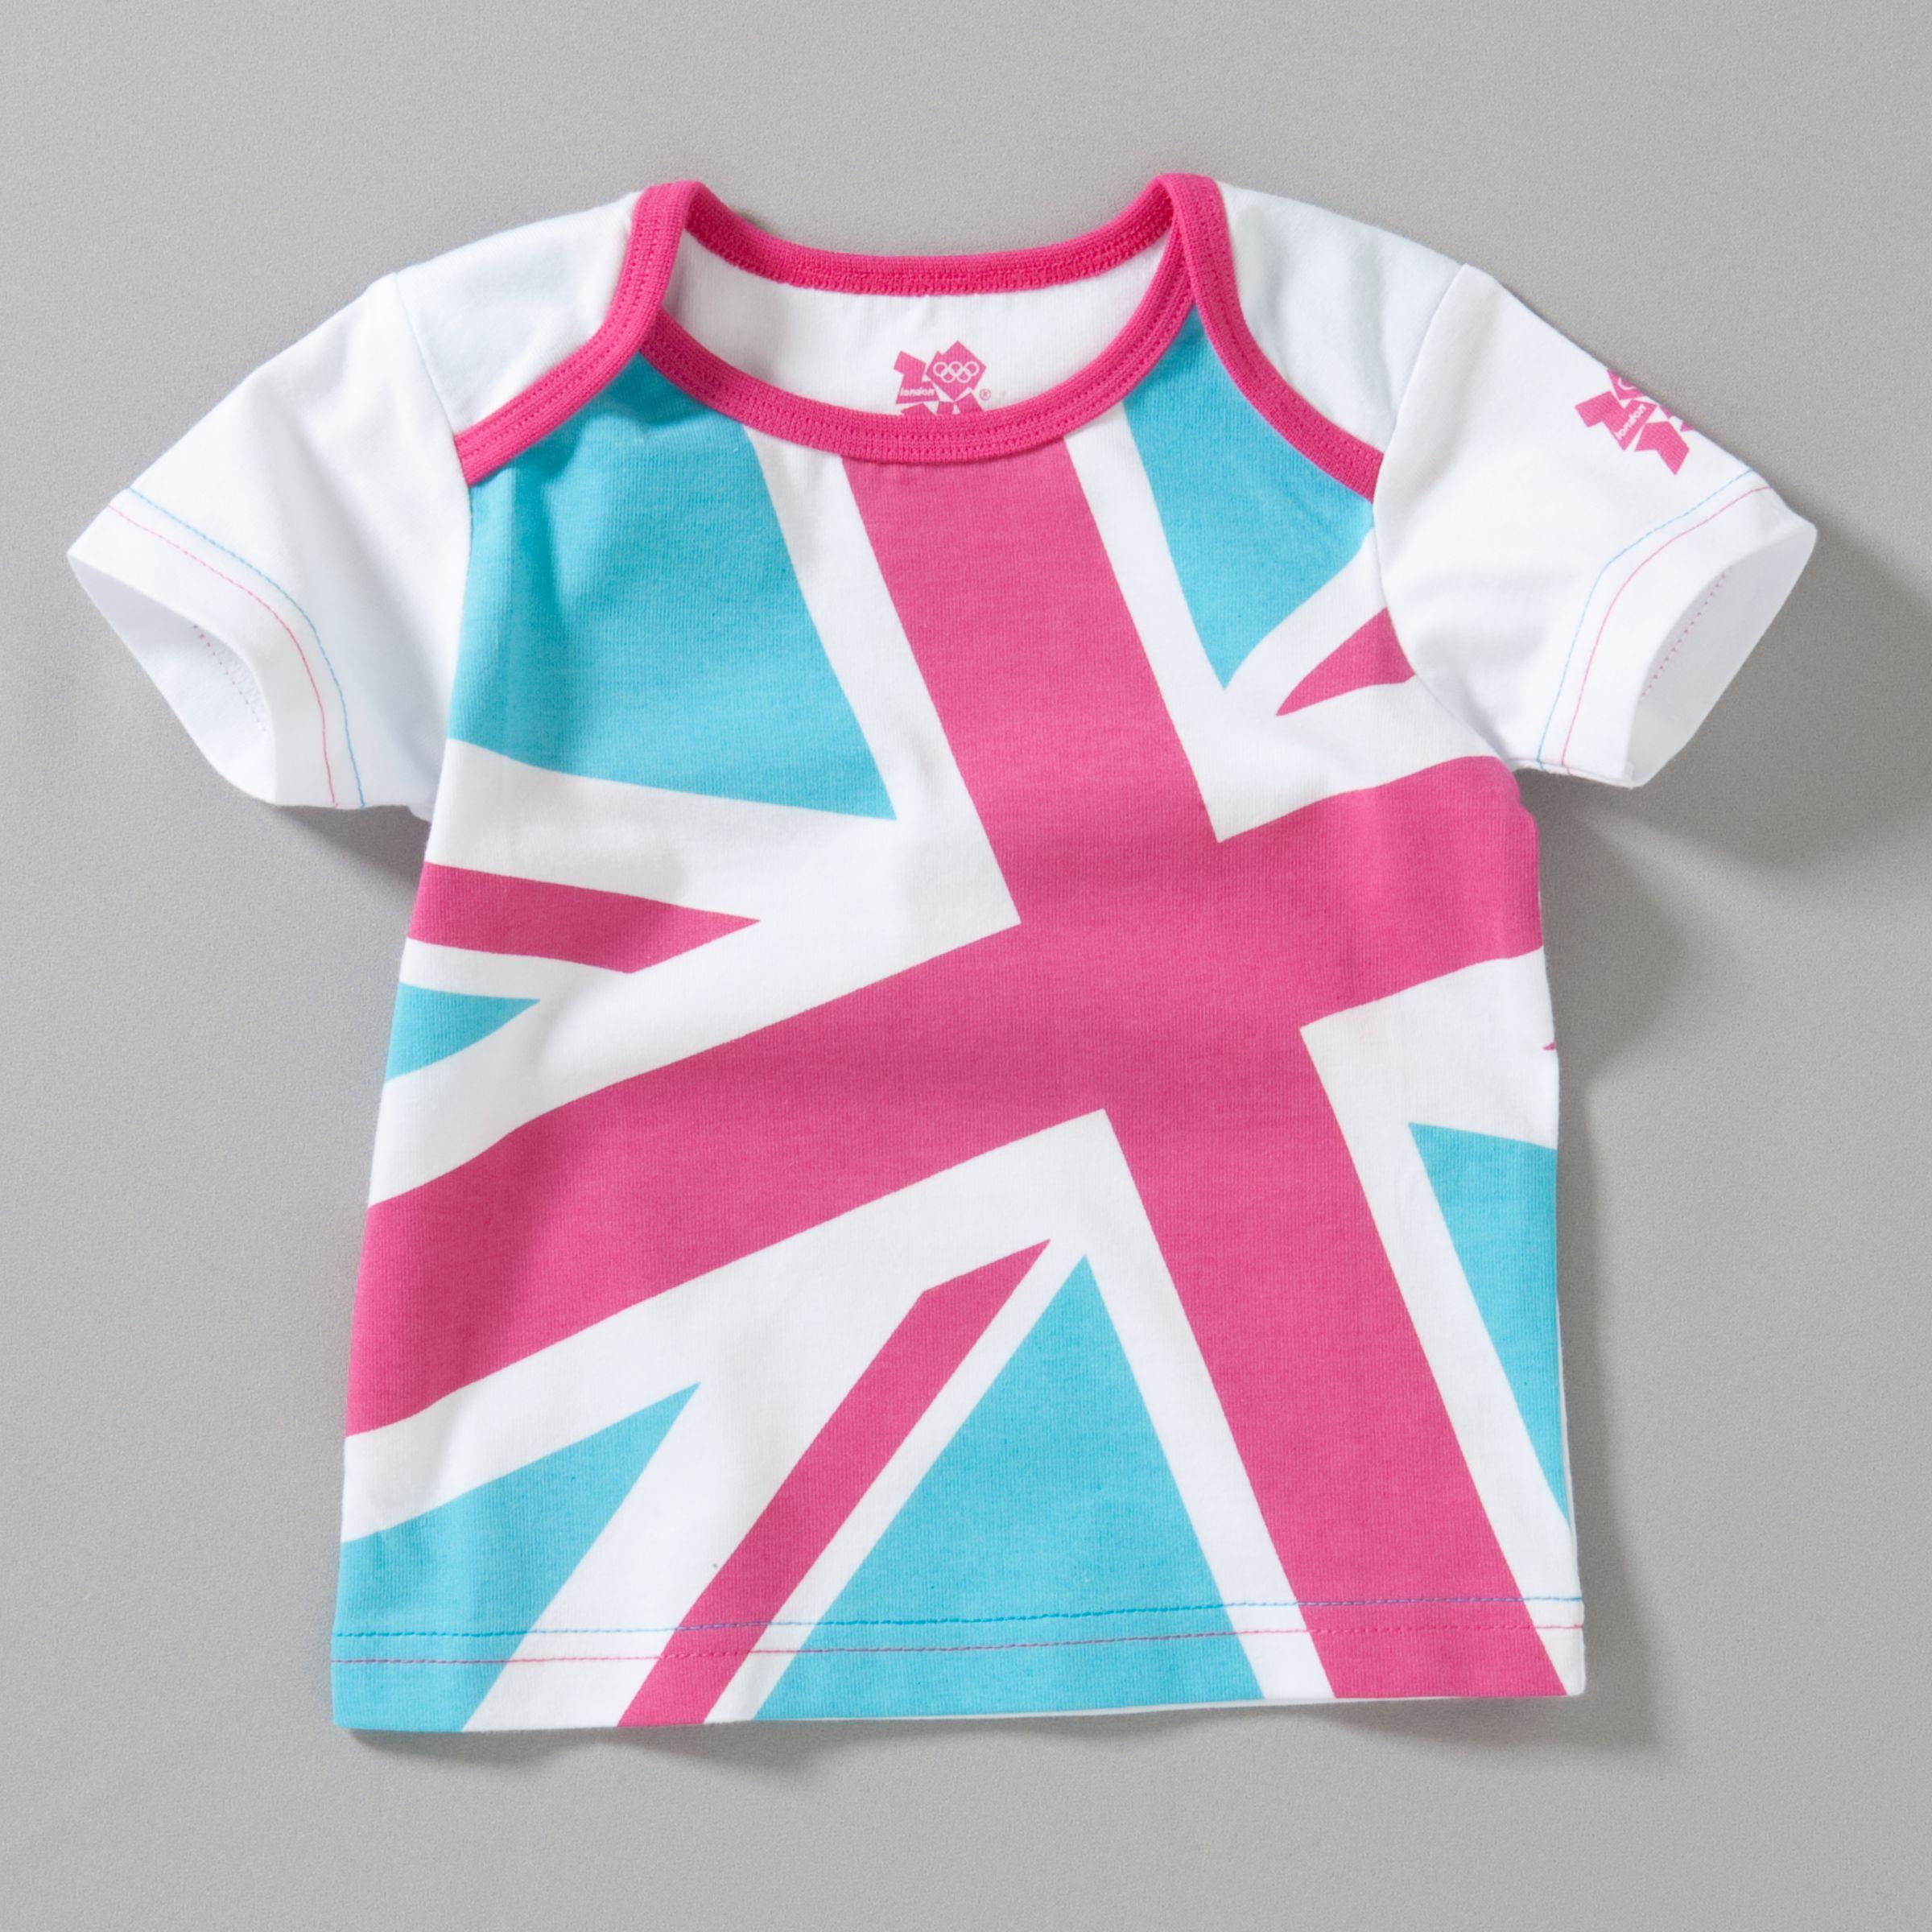 Union Jack T-Shirt, Pink